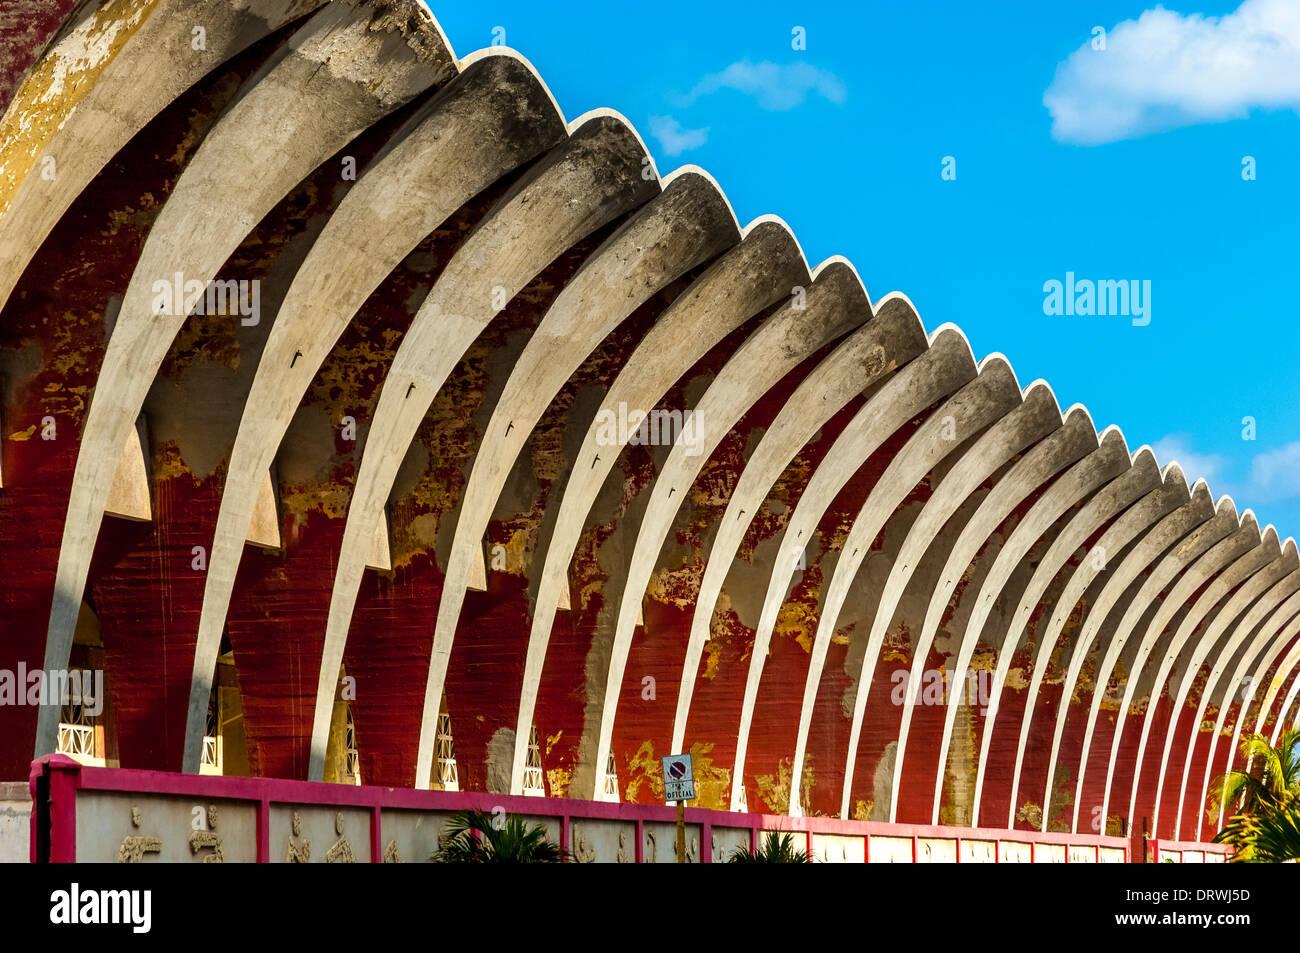 alte Fußball-Stadion, Malecon, direkt am Meer Bereich, Havanna, Kuba, Caribbean Stockbild